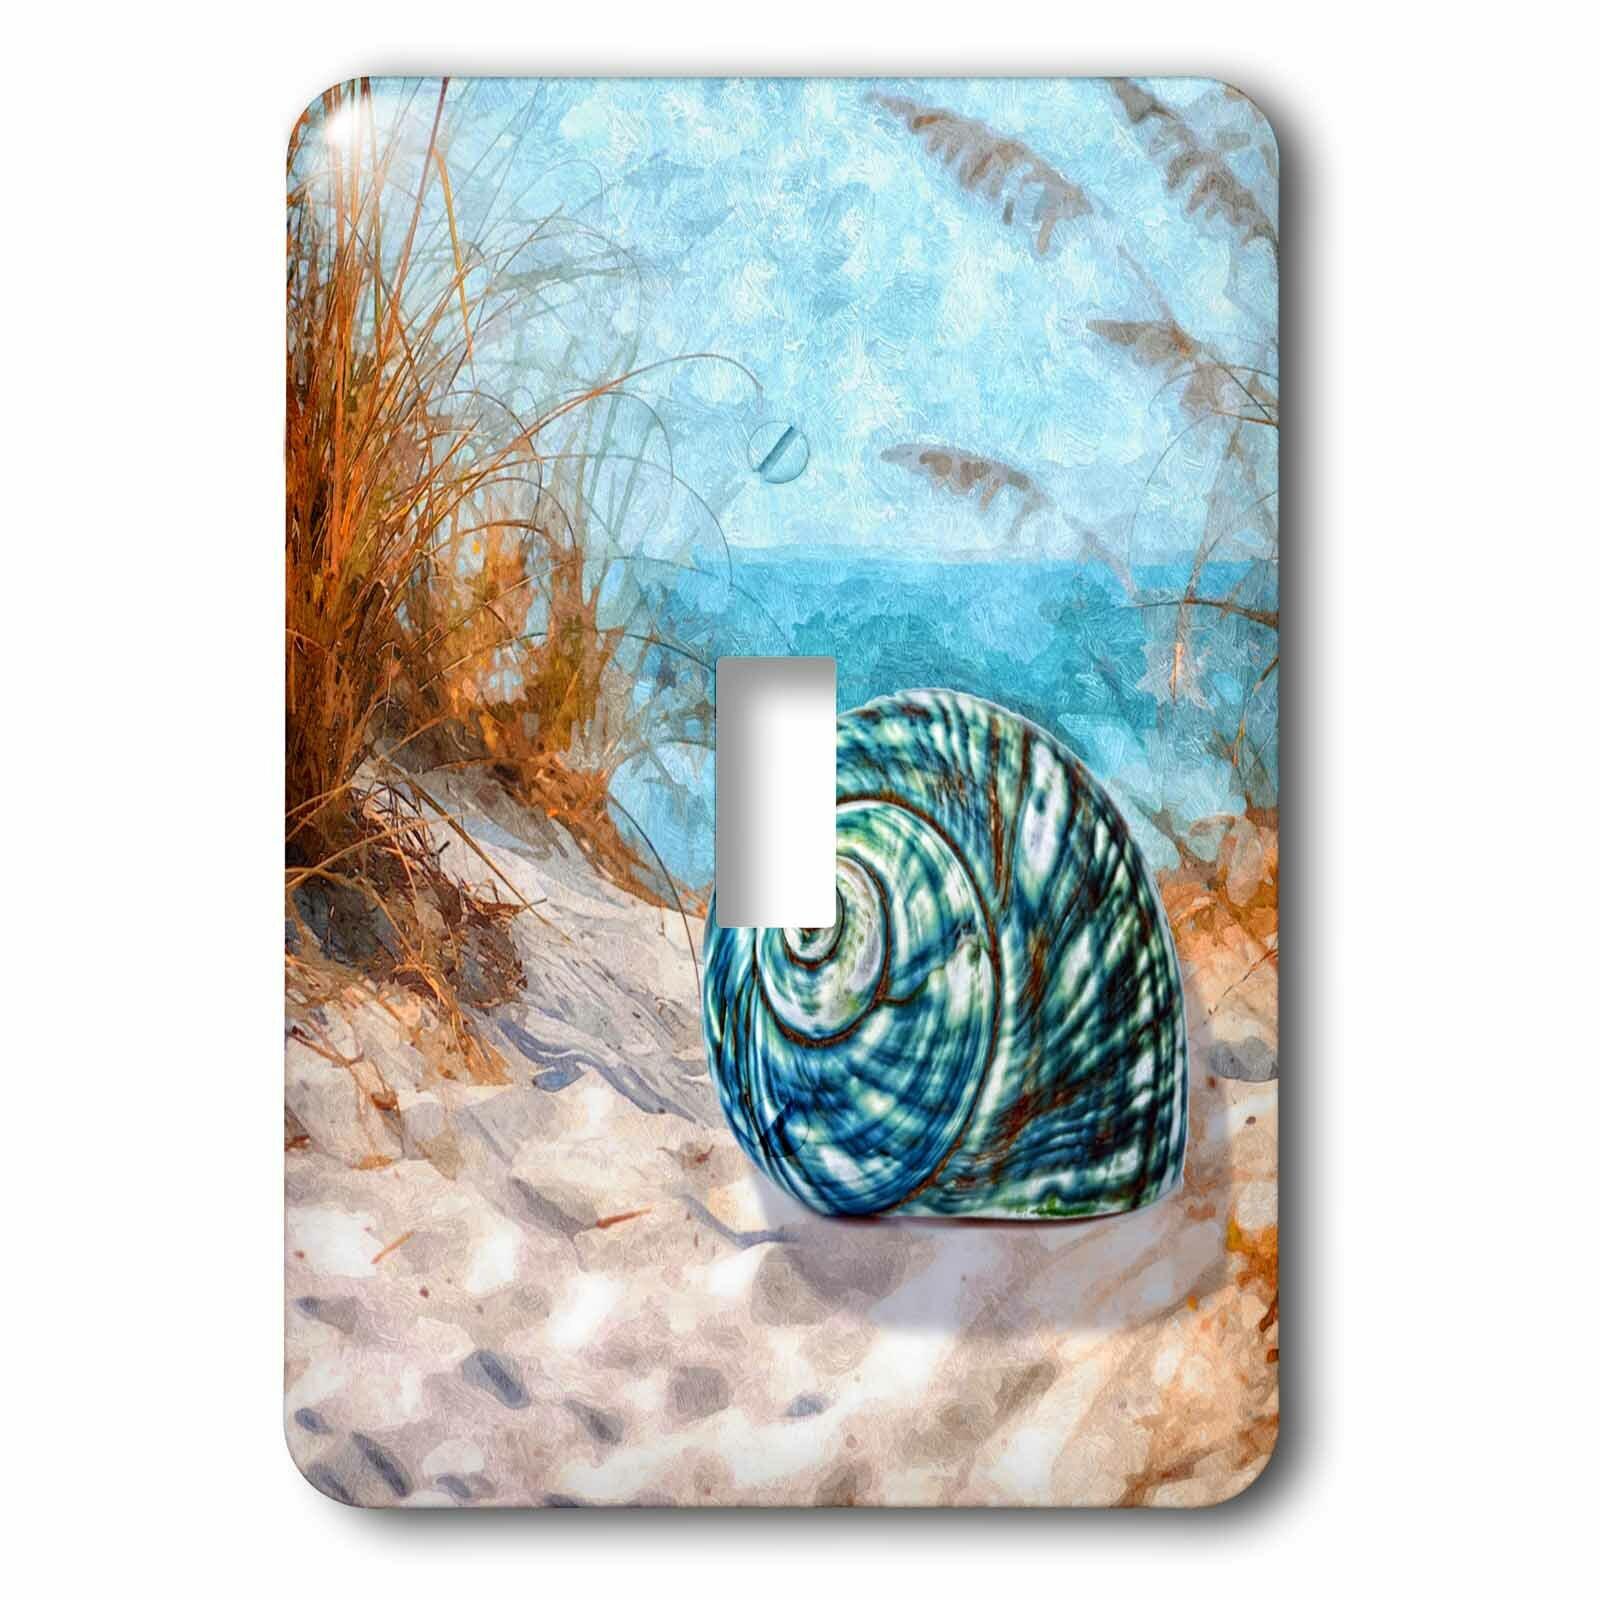 3drose Seashell On The Beach 1 Gang Toggle Light Switch Wall Plate Wayfair